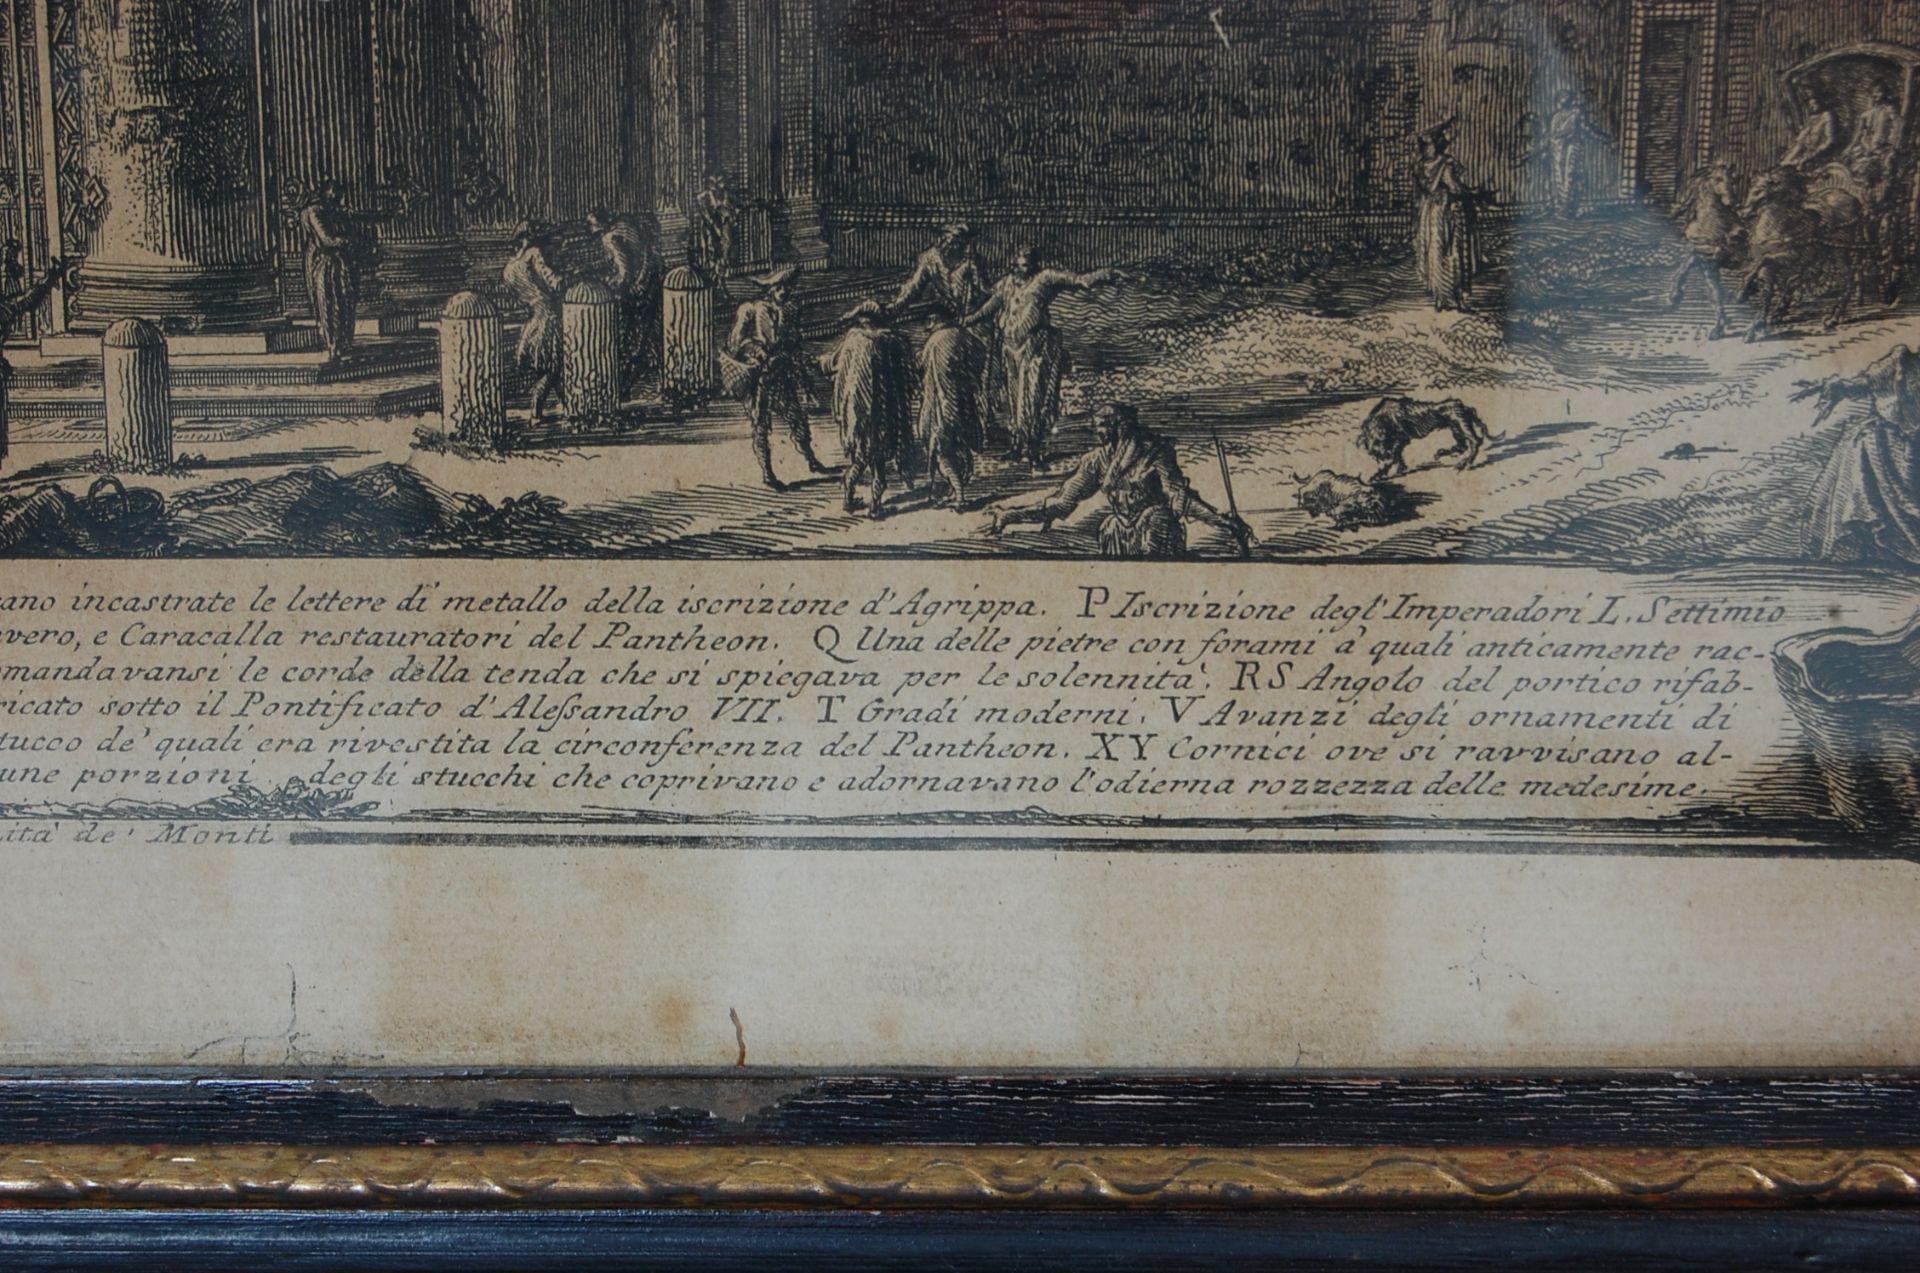 PANTHEON D'AGRIPPA AFTER GIOVANNI BATTISTA PIRANESI - Bild 8 aus 11